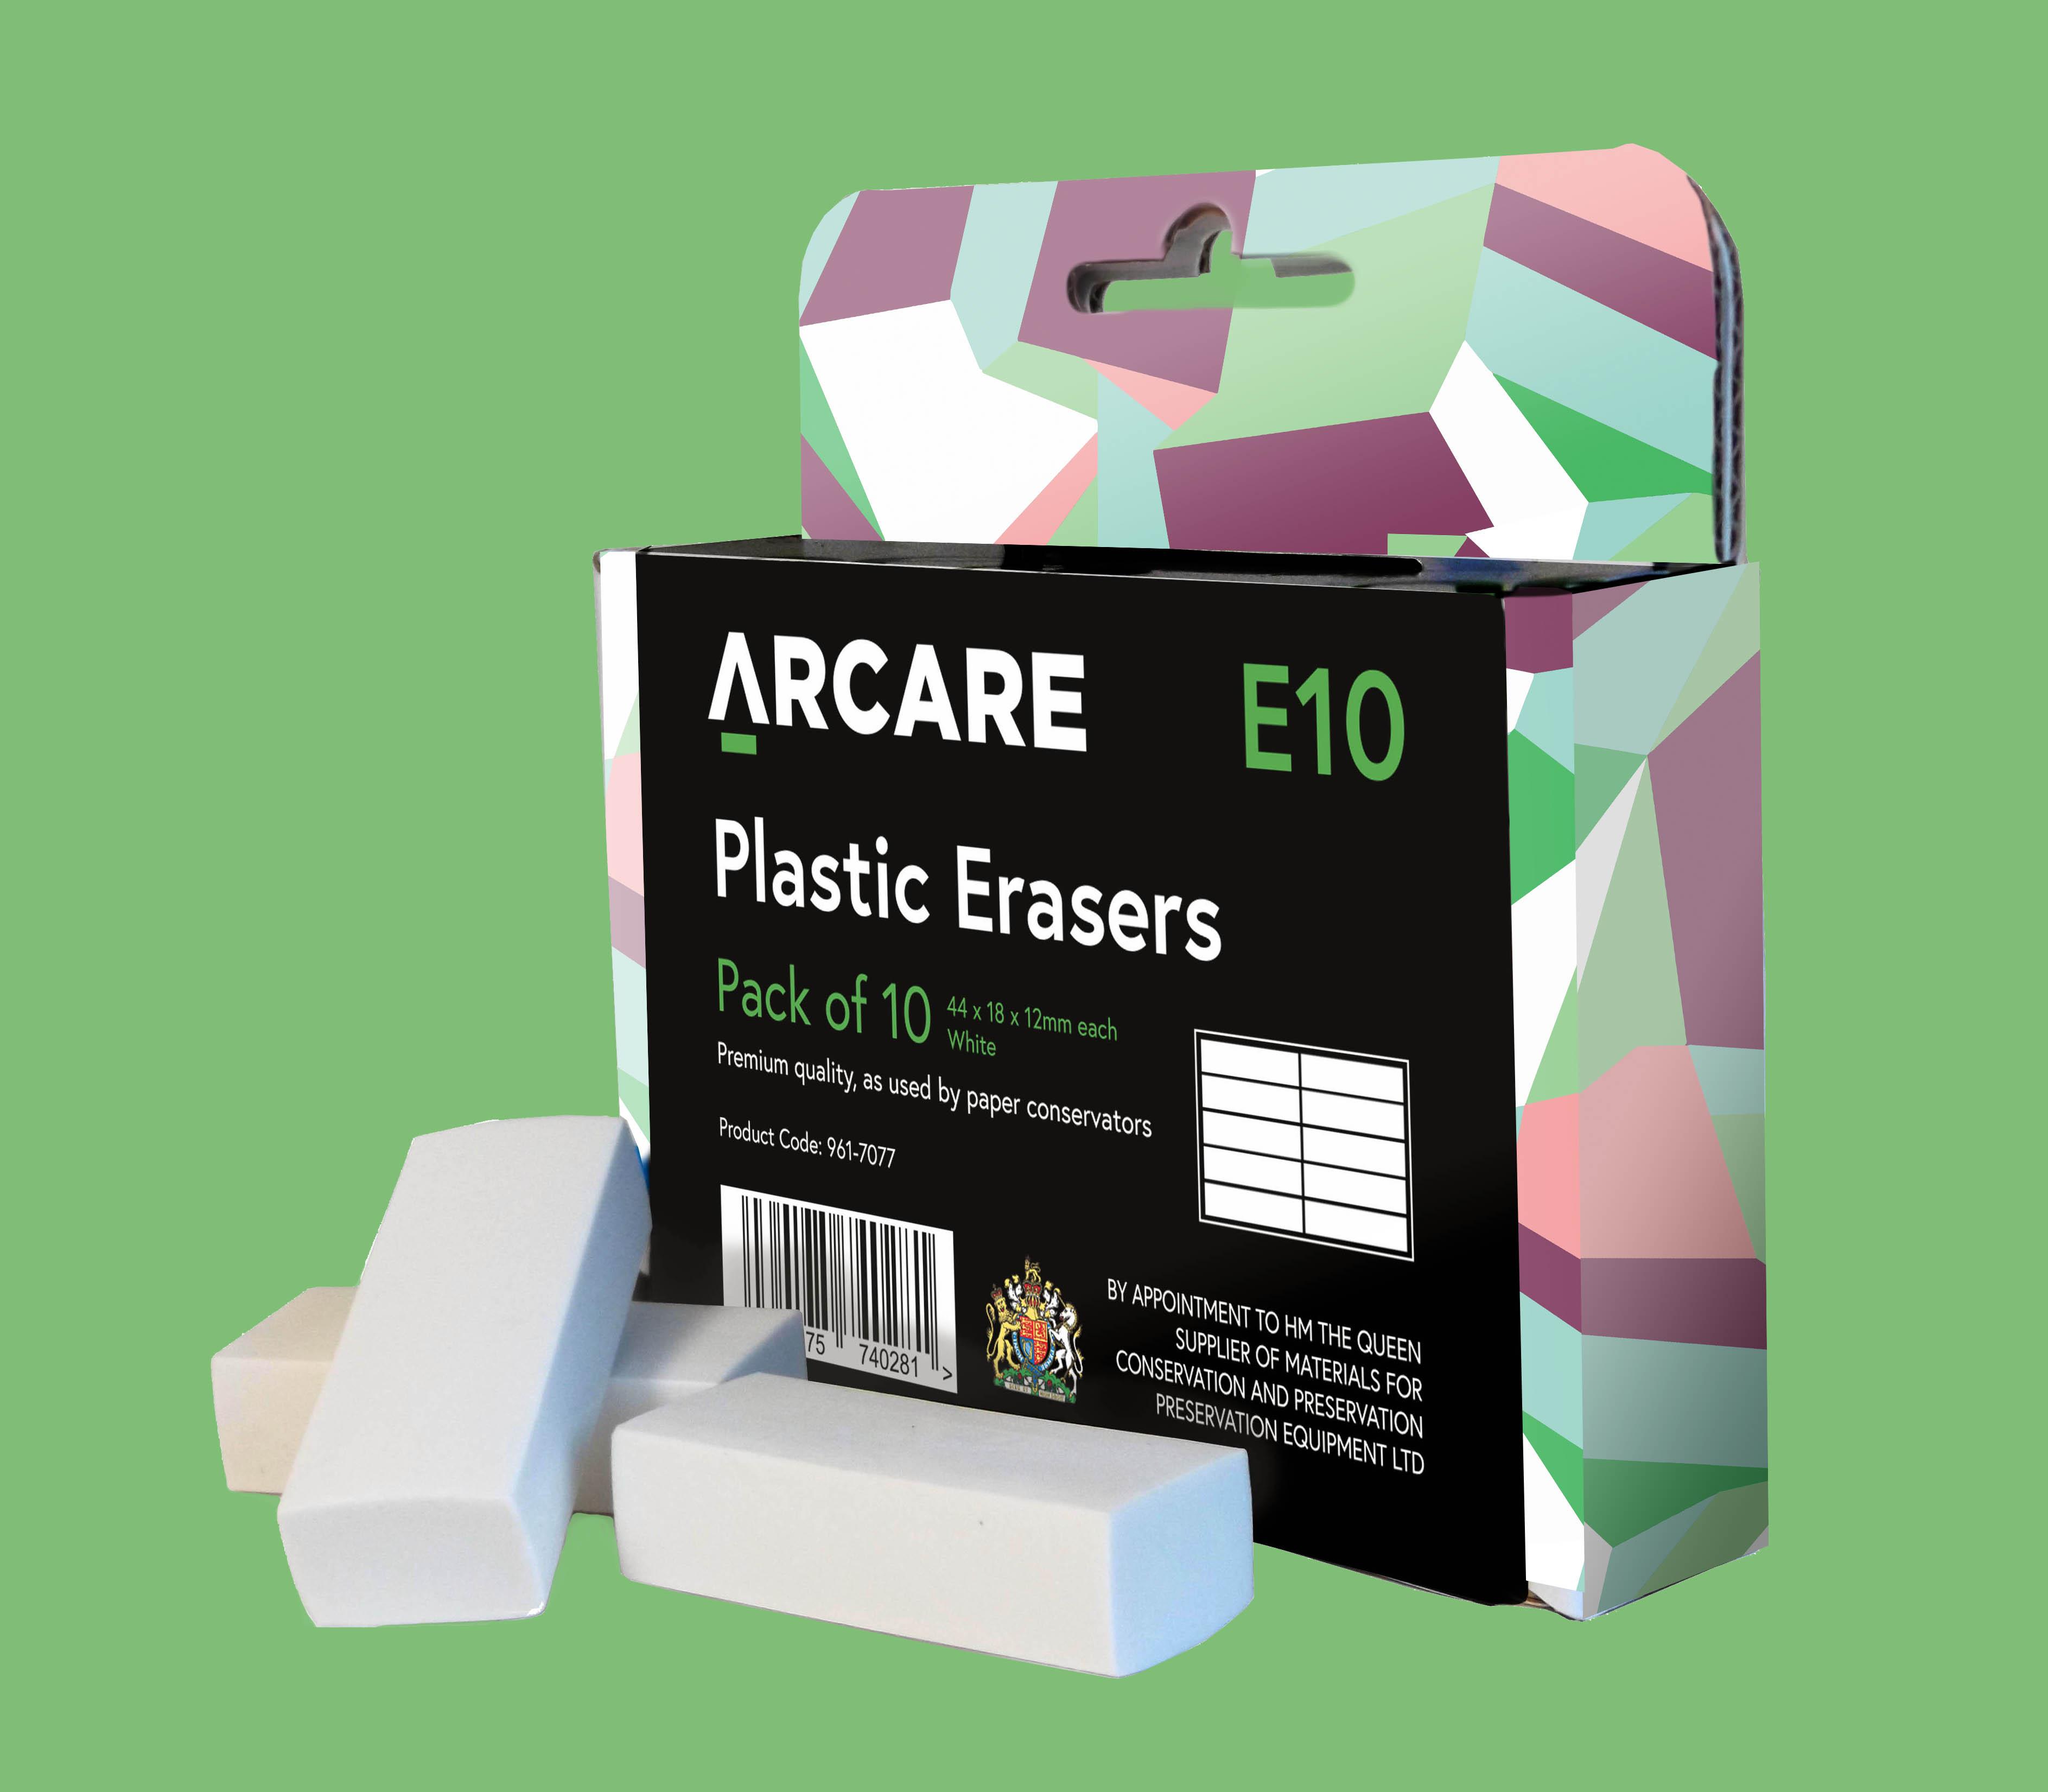 Arcare Erasers